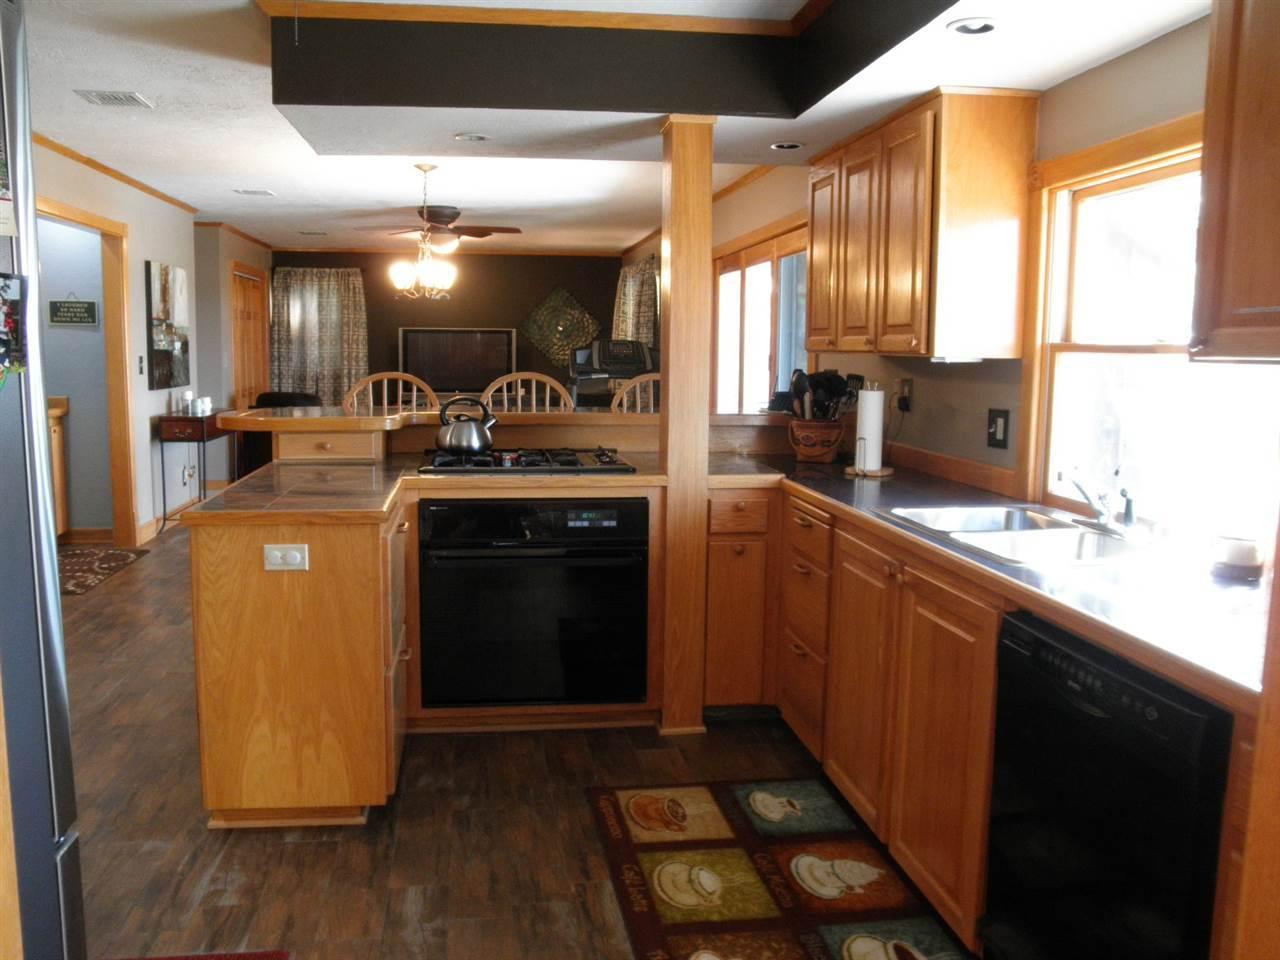 Sold Intraoffice W/MLS | 7038 River Ridge Drive  Ponca City, OK 74604 6